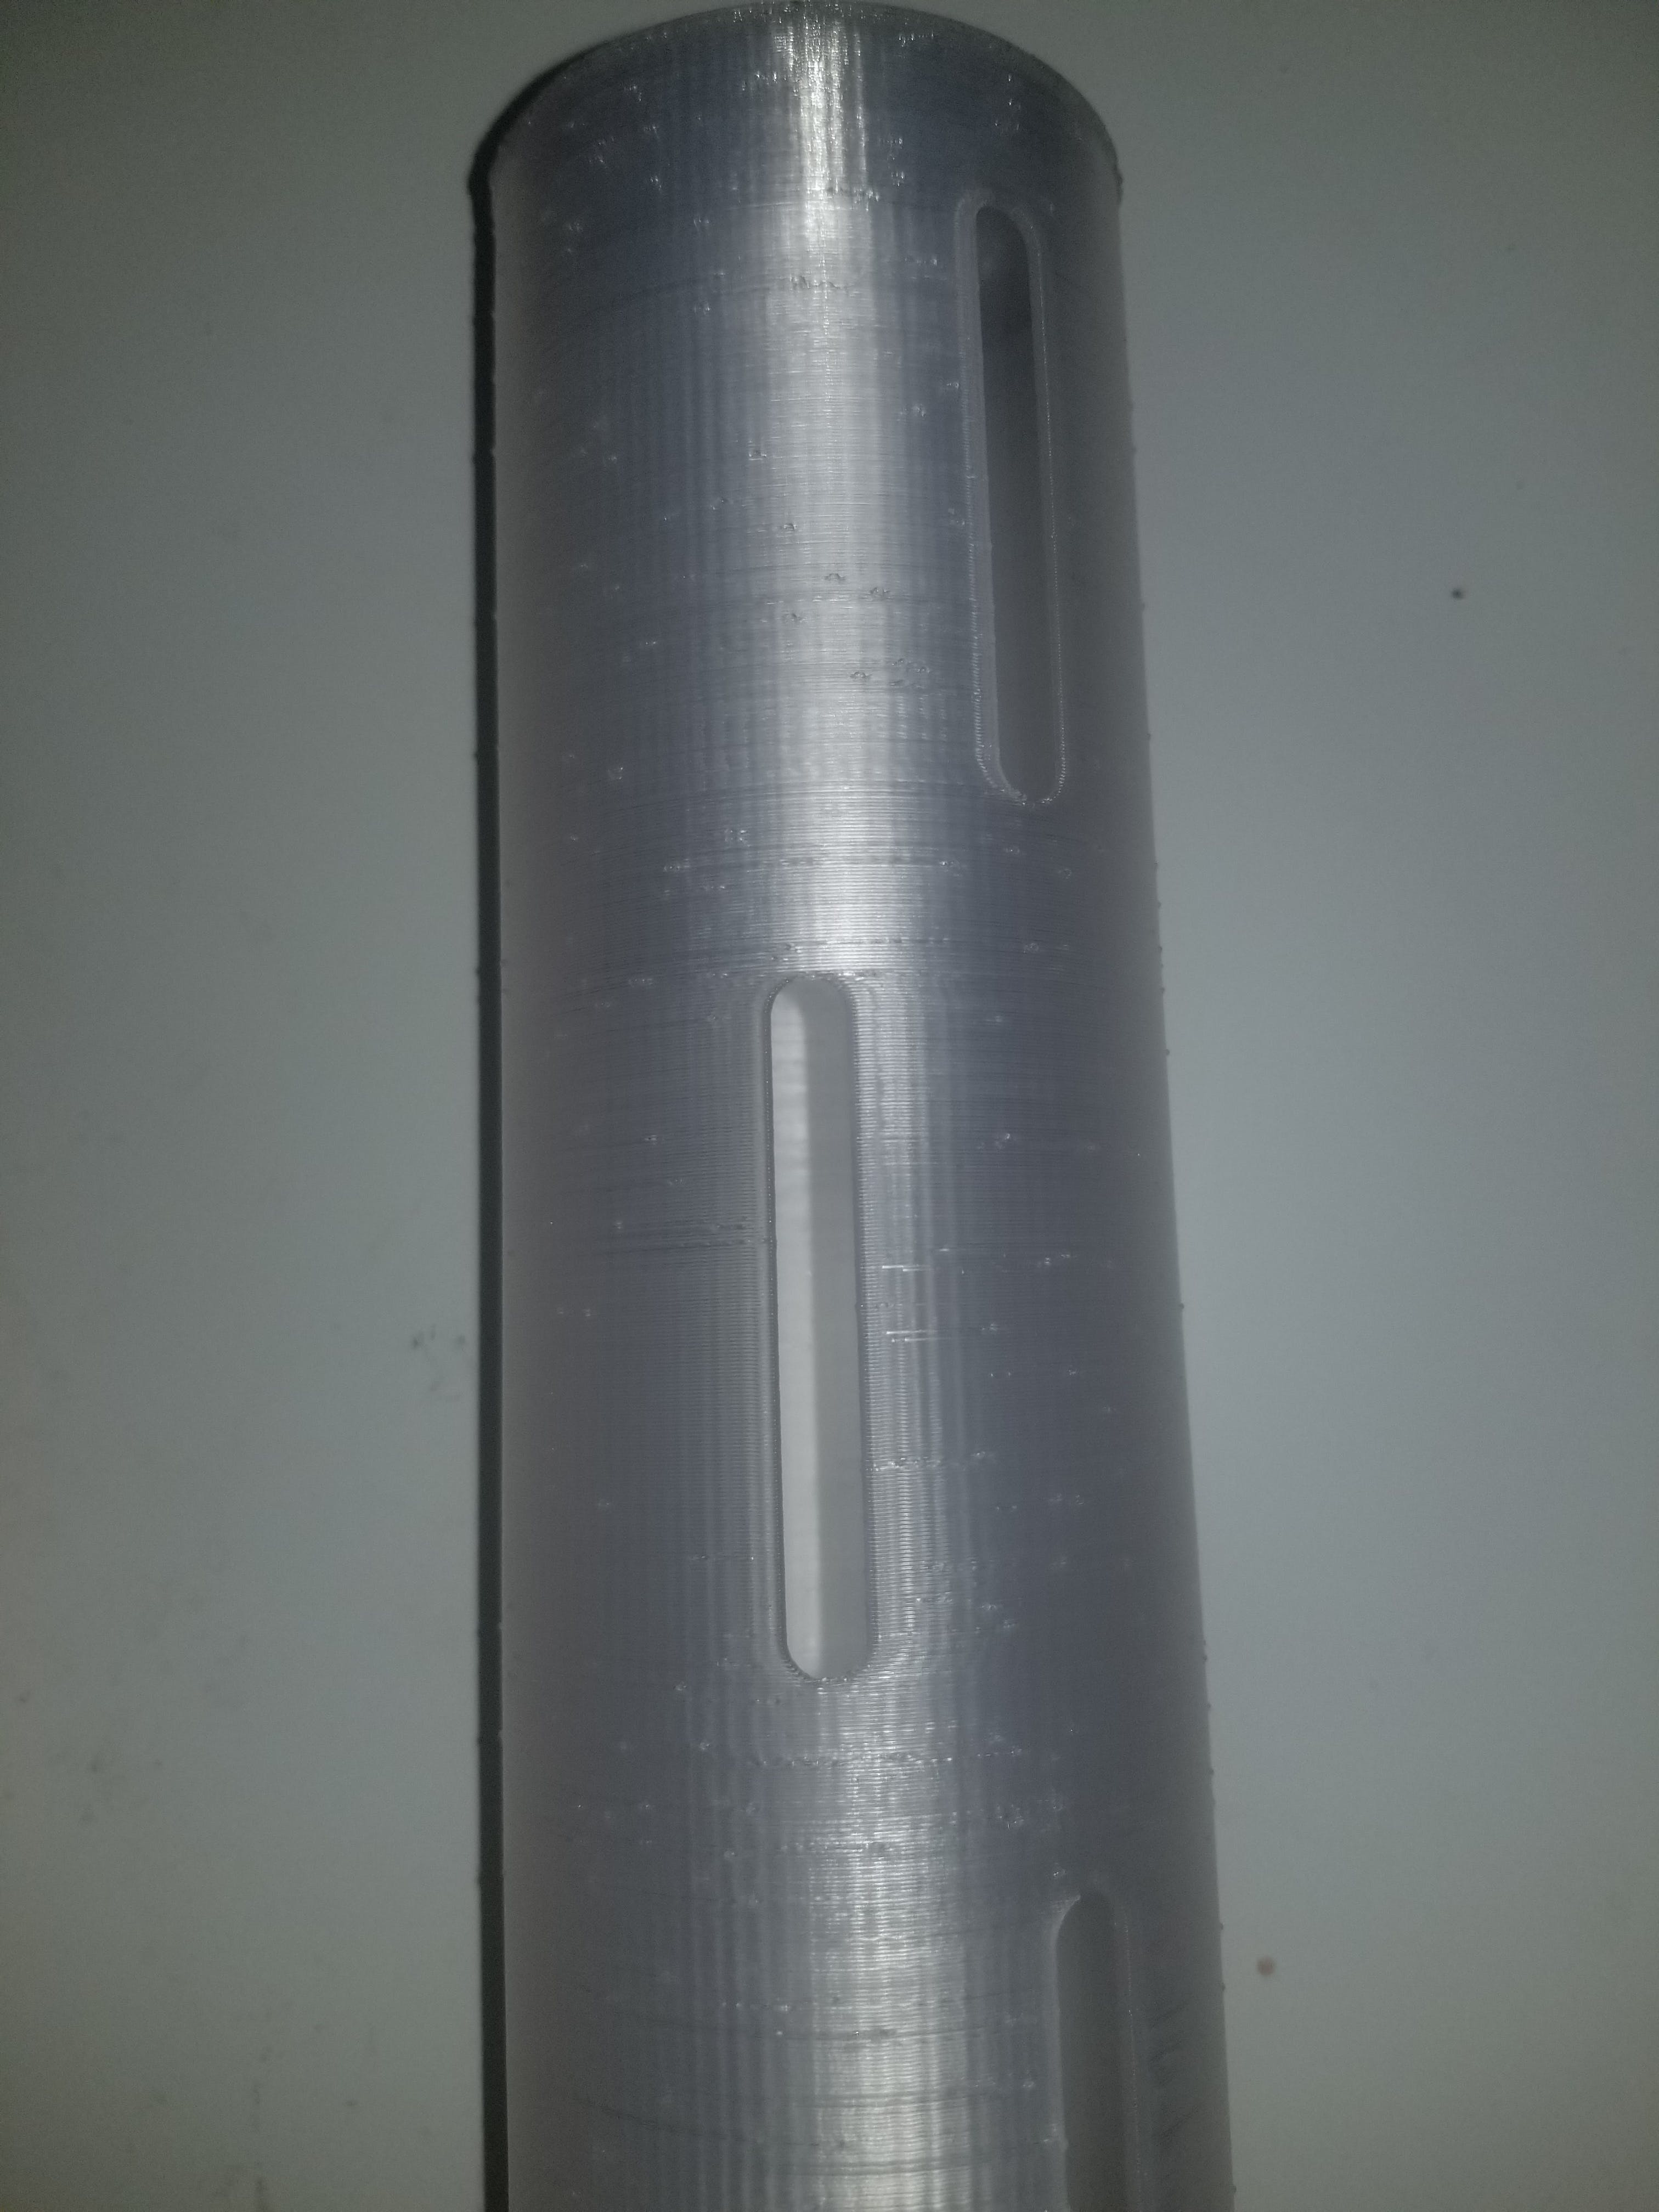 Printed Antenna